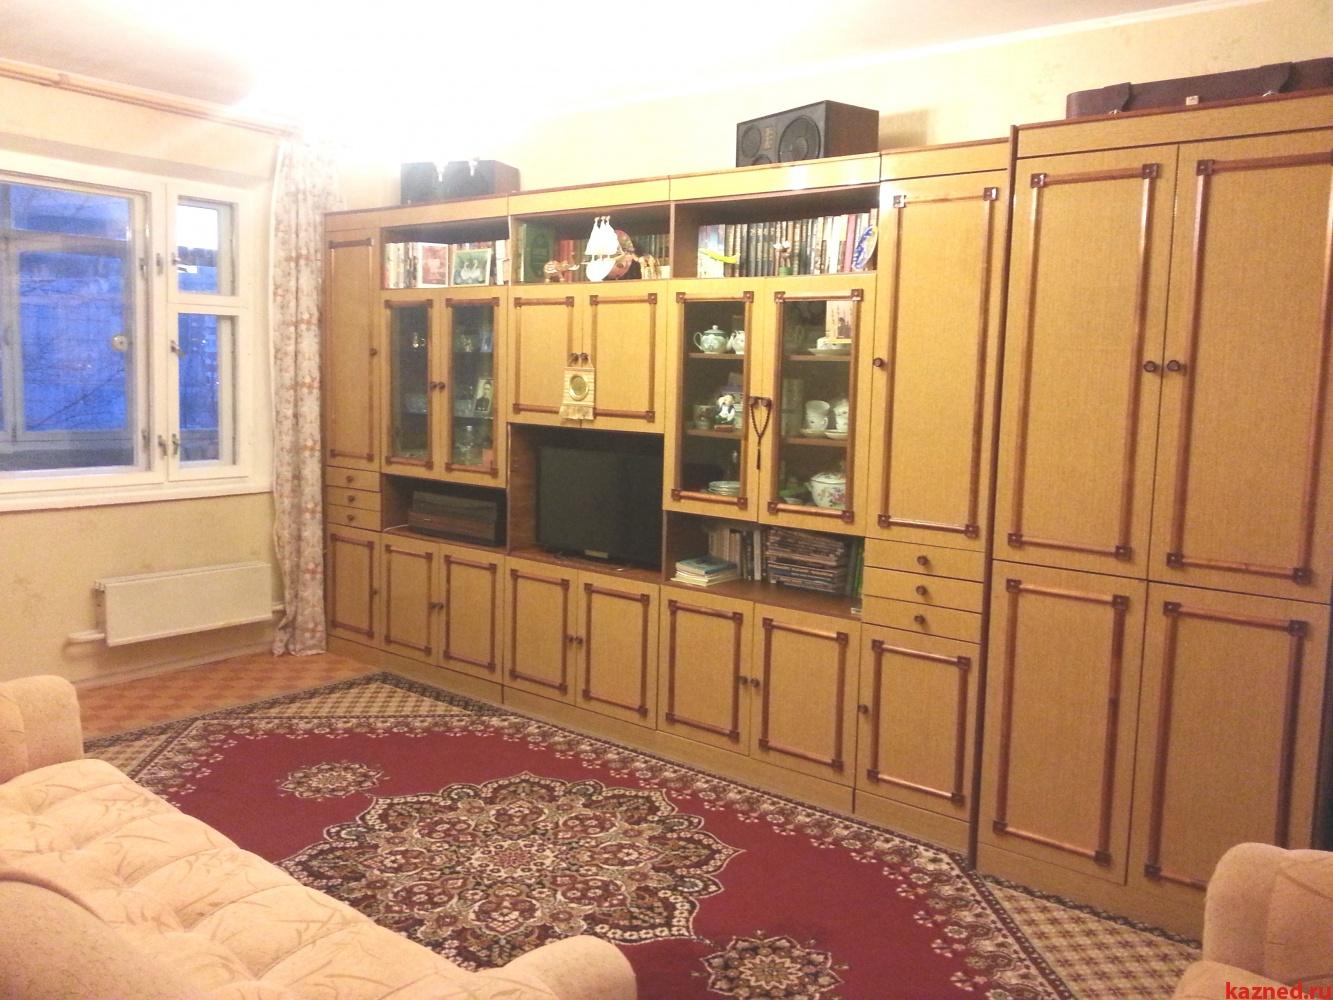 Продажа 2-к квартиры Фучика, 16, 53 м2  (миниатюра №1)